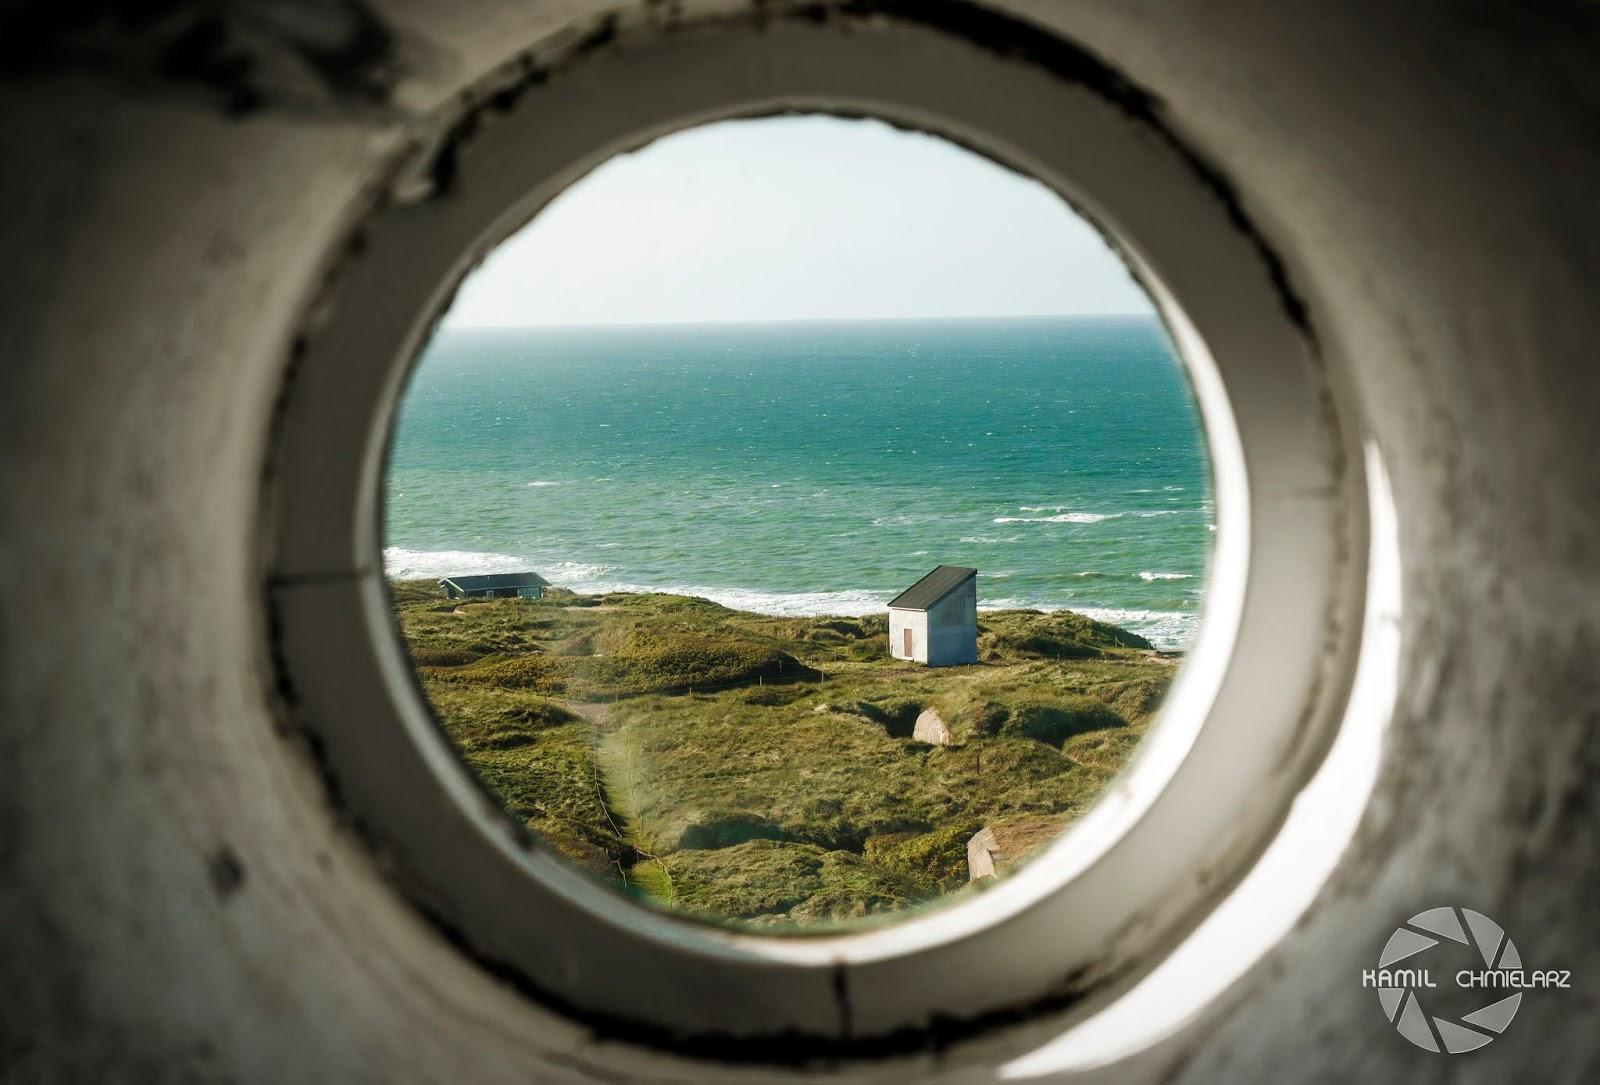 Widok z latarni morskiej w Hirsthals, Nordjylland